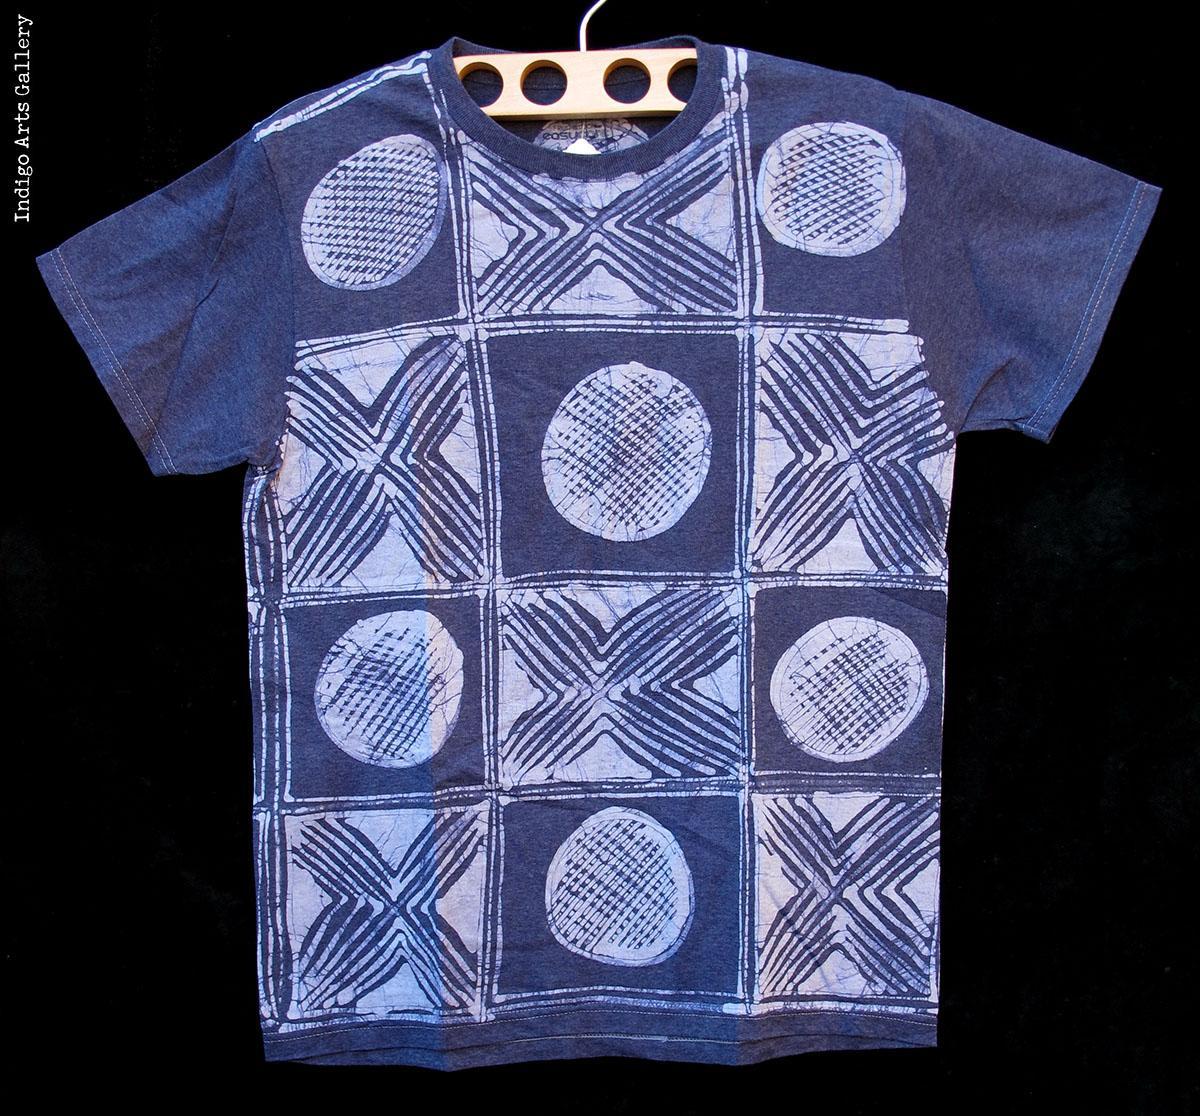 Indigo Batik T Shirt By Gasali Adeyemo